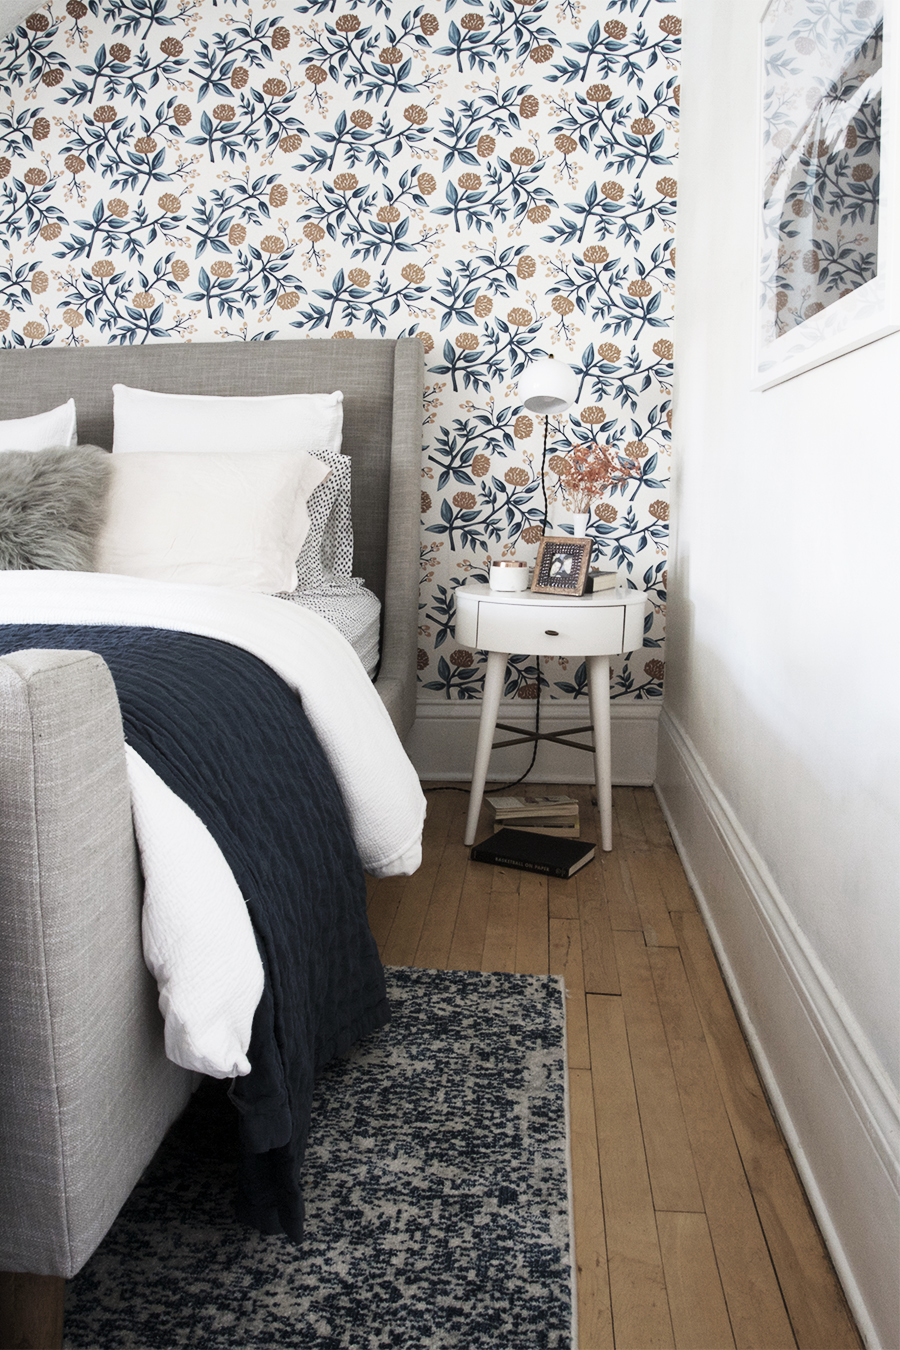 Still Love it! My Scandinavian(ish) bedroom || Deuce Cities Henhouse